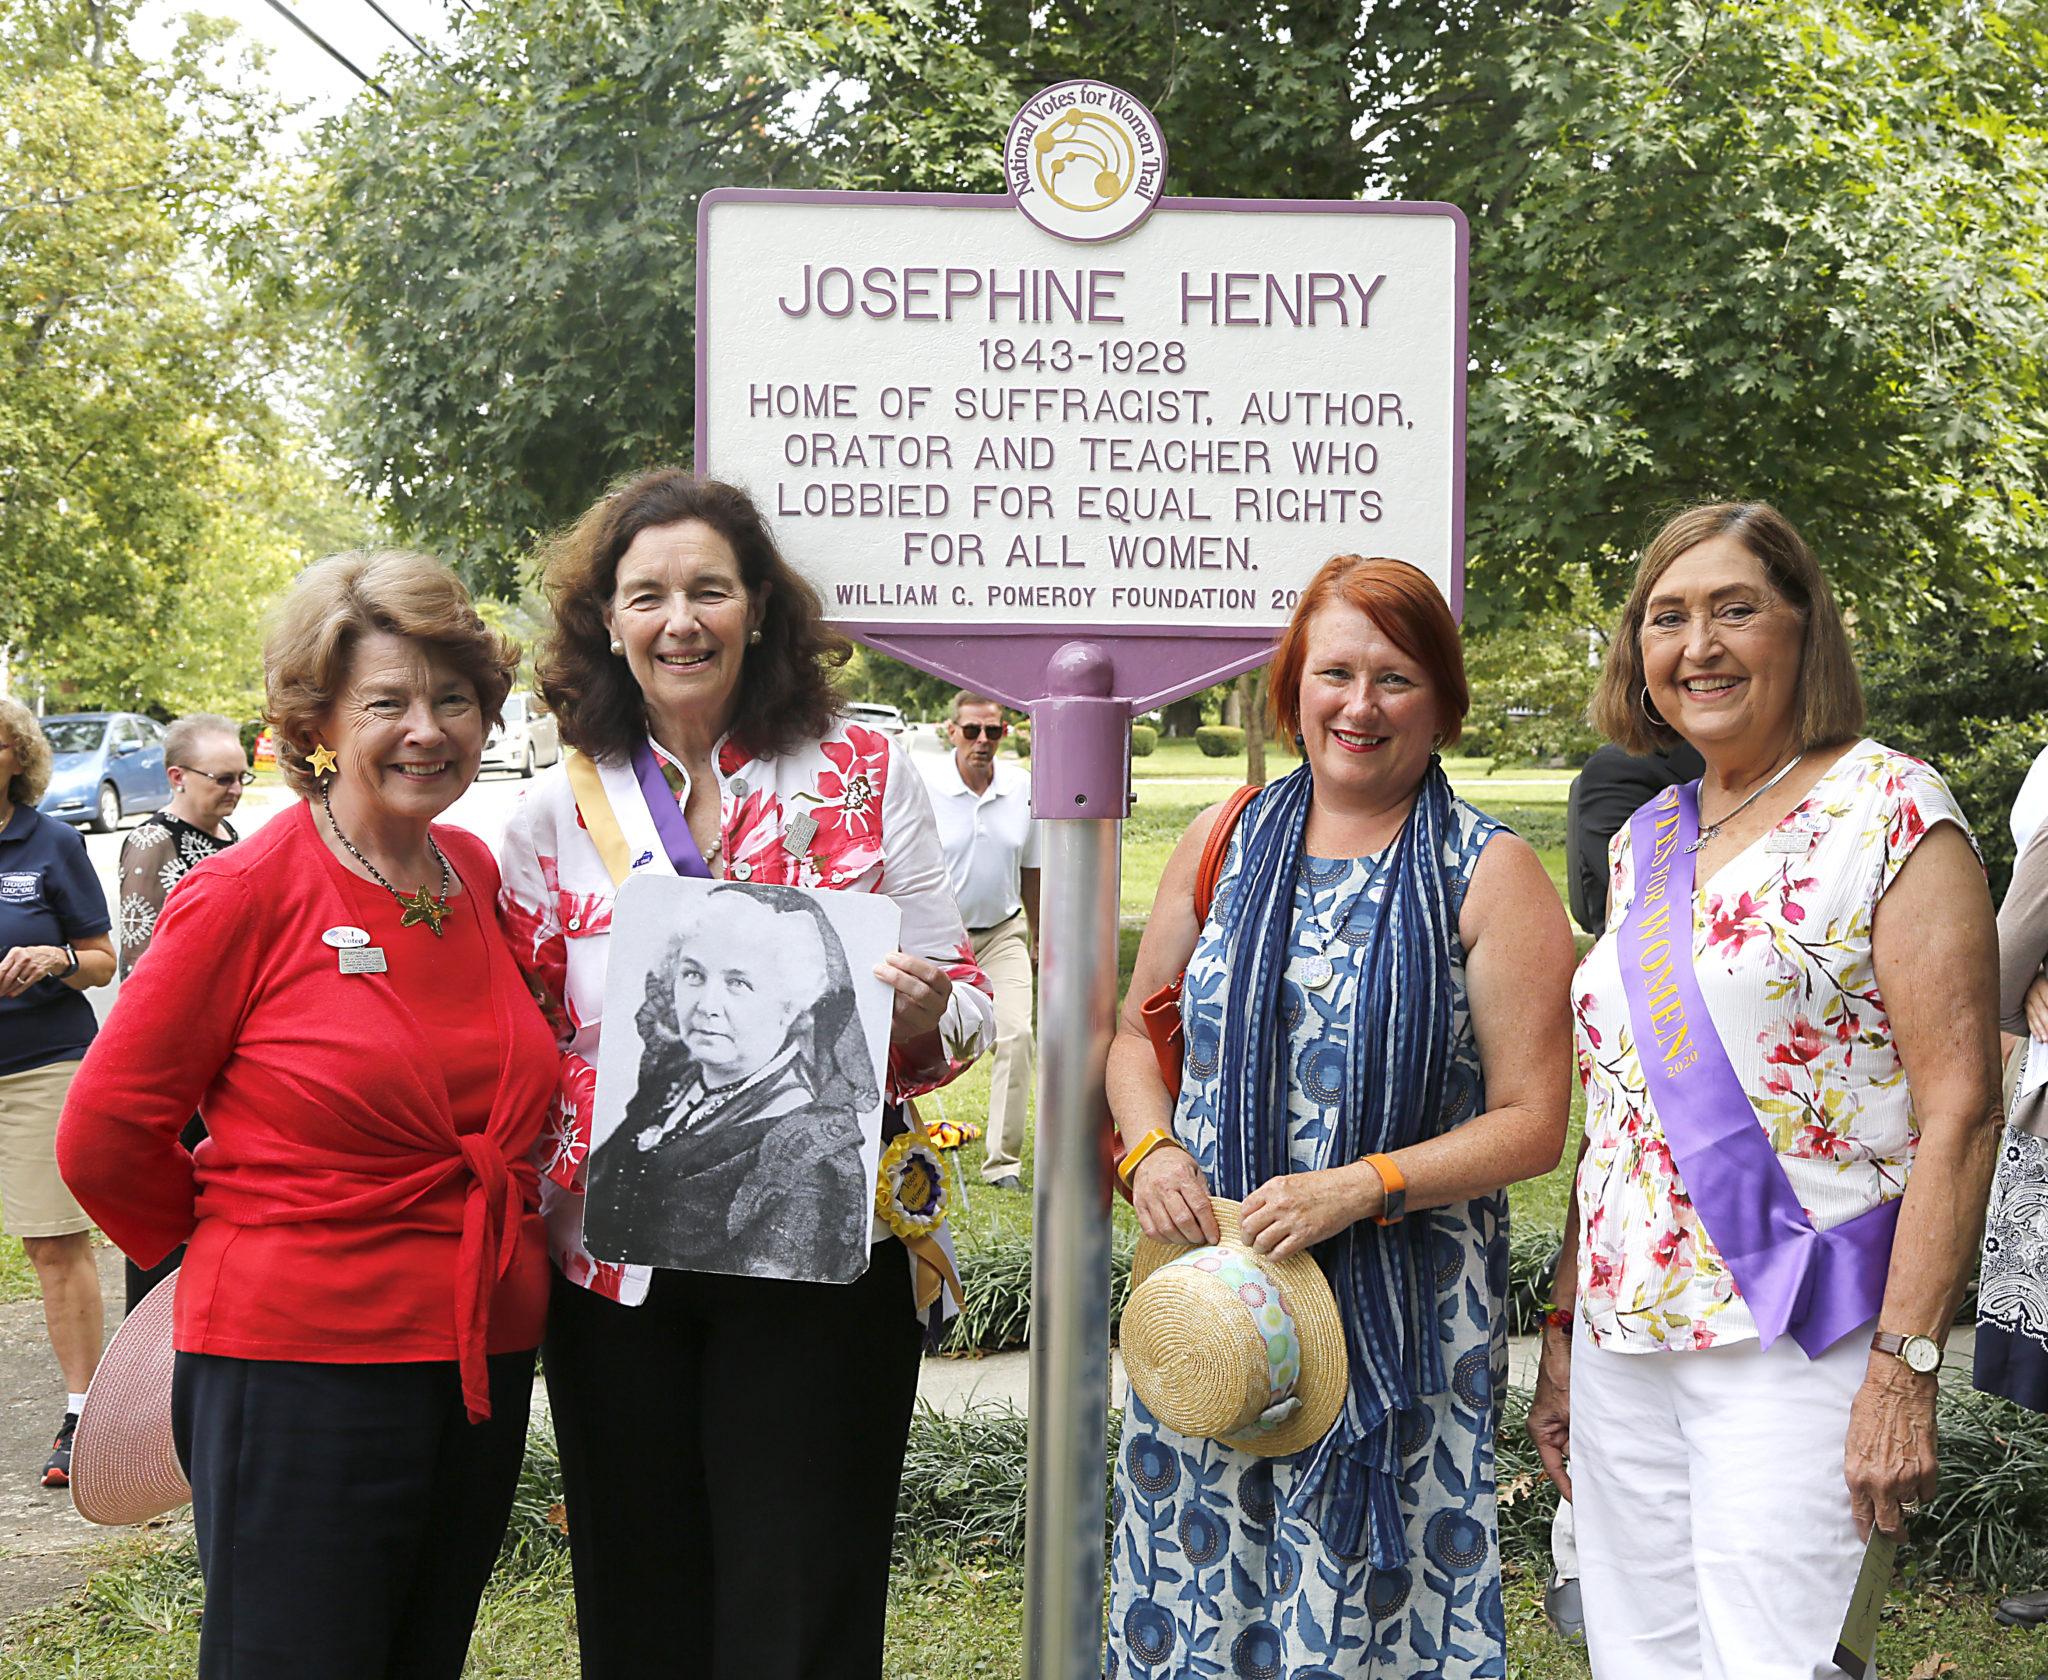 Josephine Henry's Pomeroy Marker Dedication